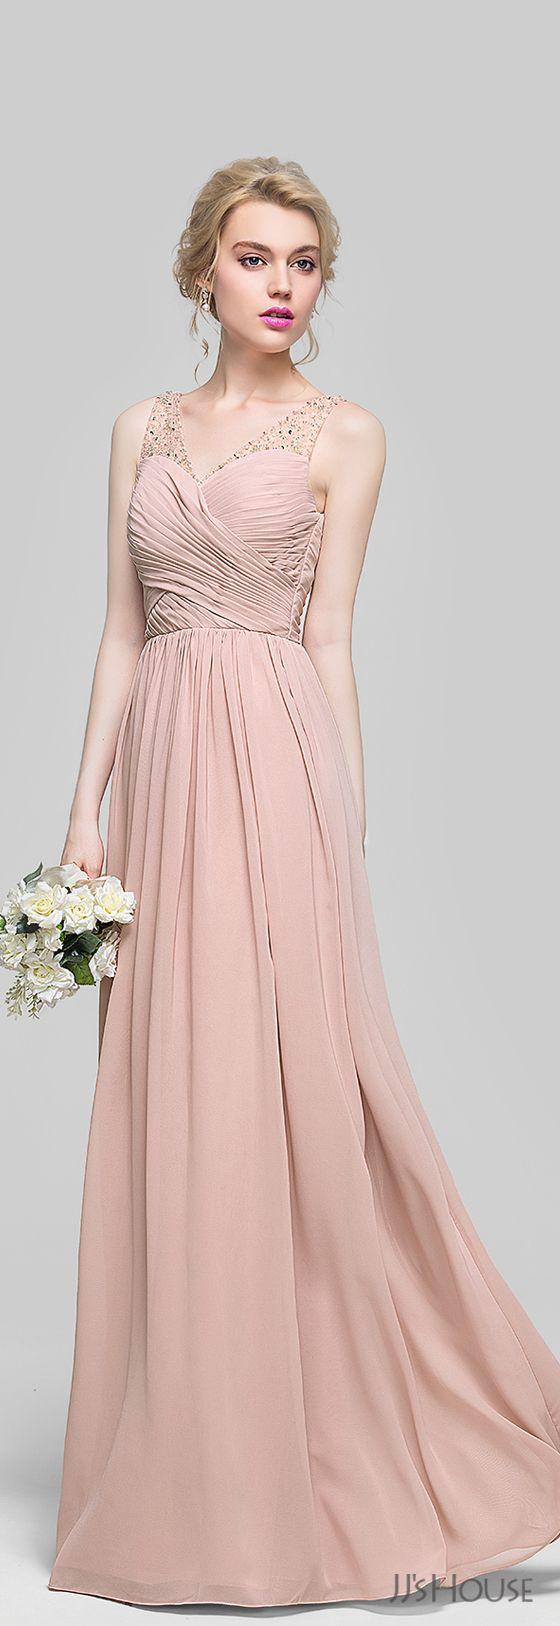 JJsHouse #Bridesmaid | New | Pinterest | Vestidos de dama, Vestido ...